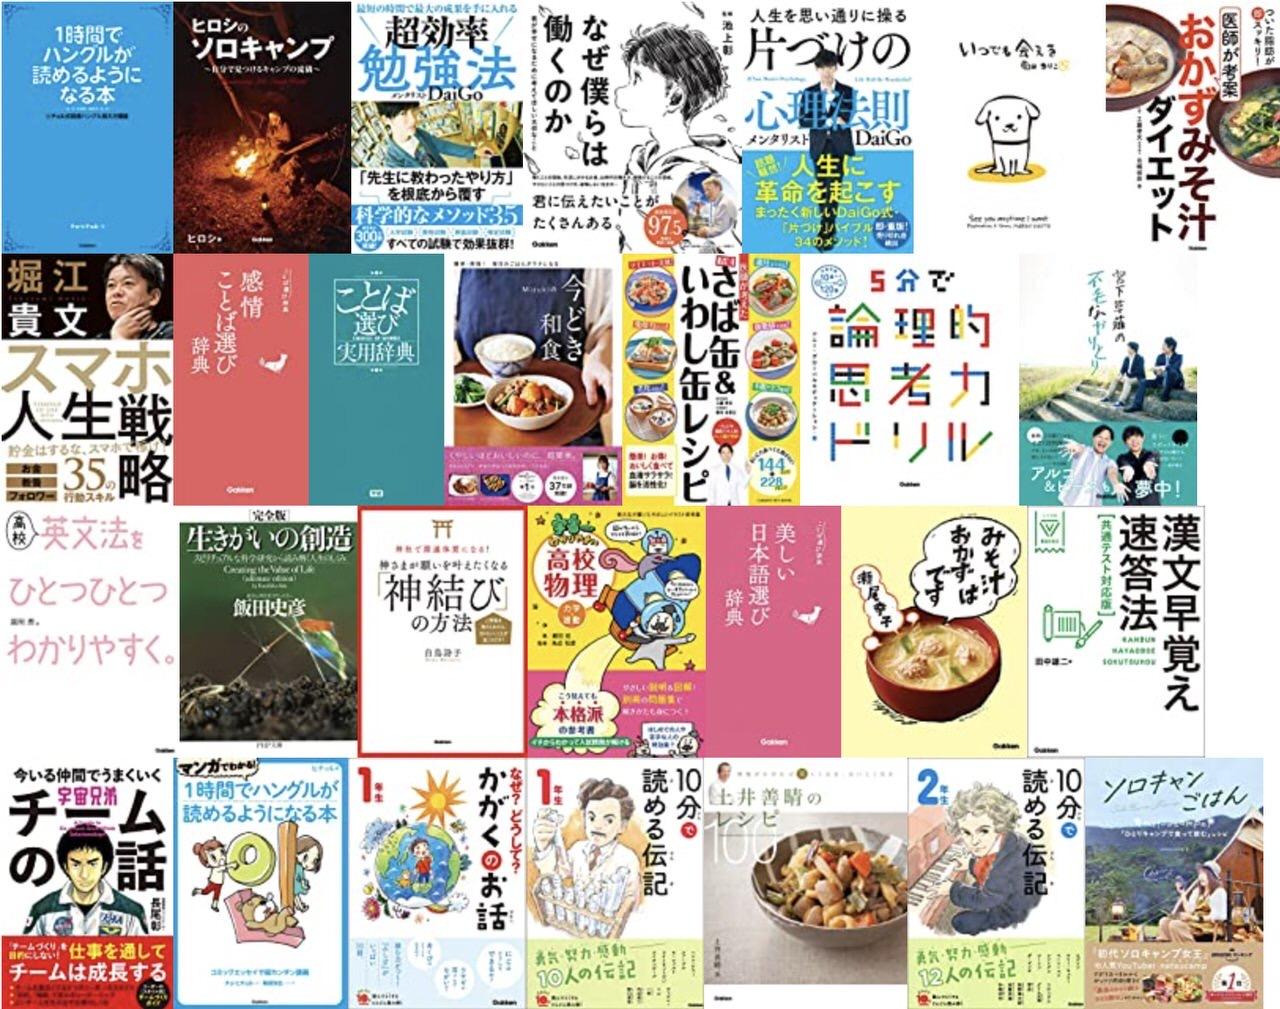 Kindle sale 202102221000